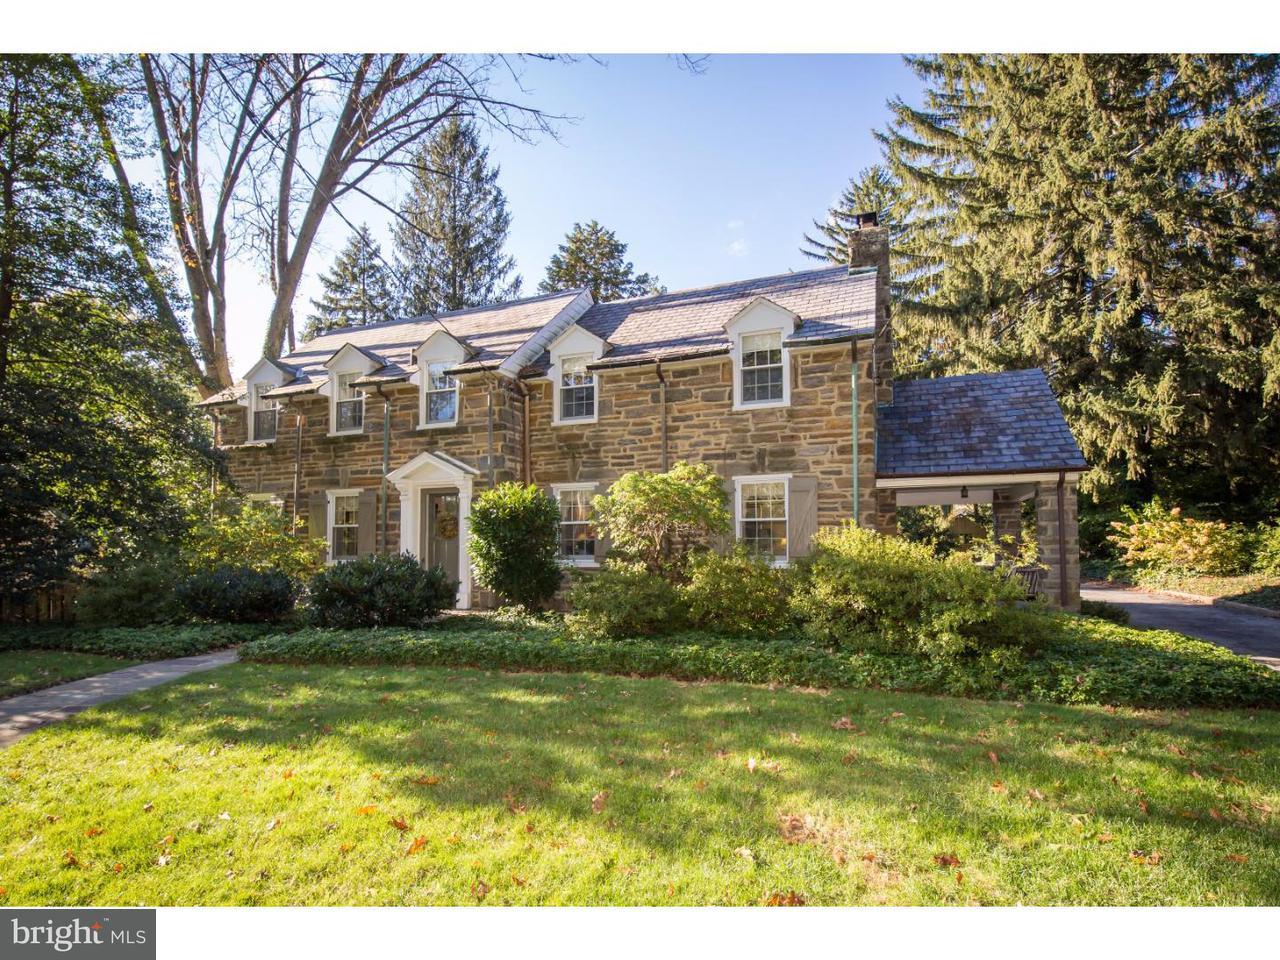 Single Family Home for Sale at 525 E MERMAID Lane Wyndmoor, Pennsylvania 19038 United States